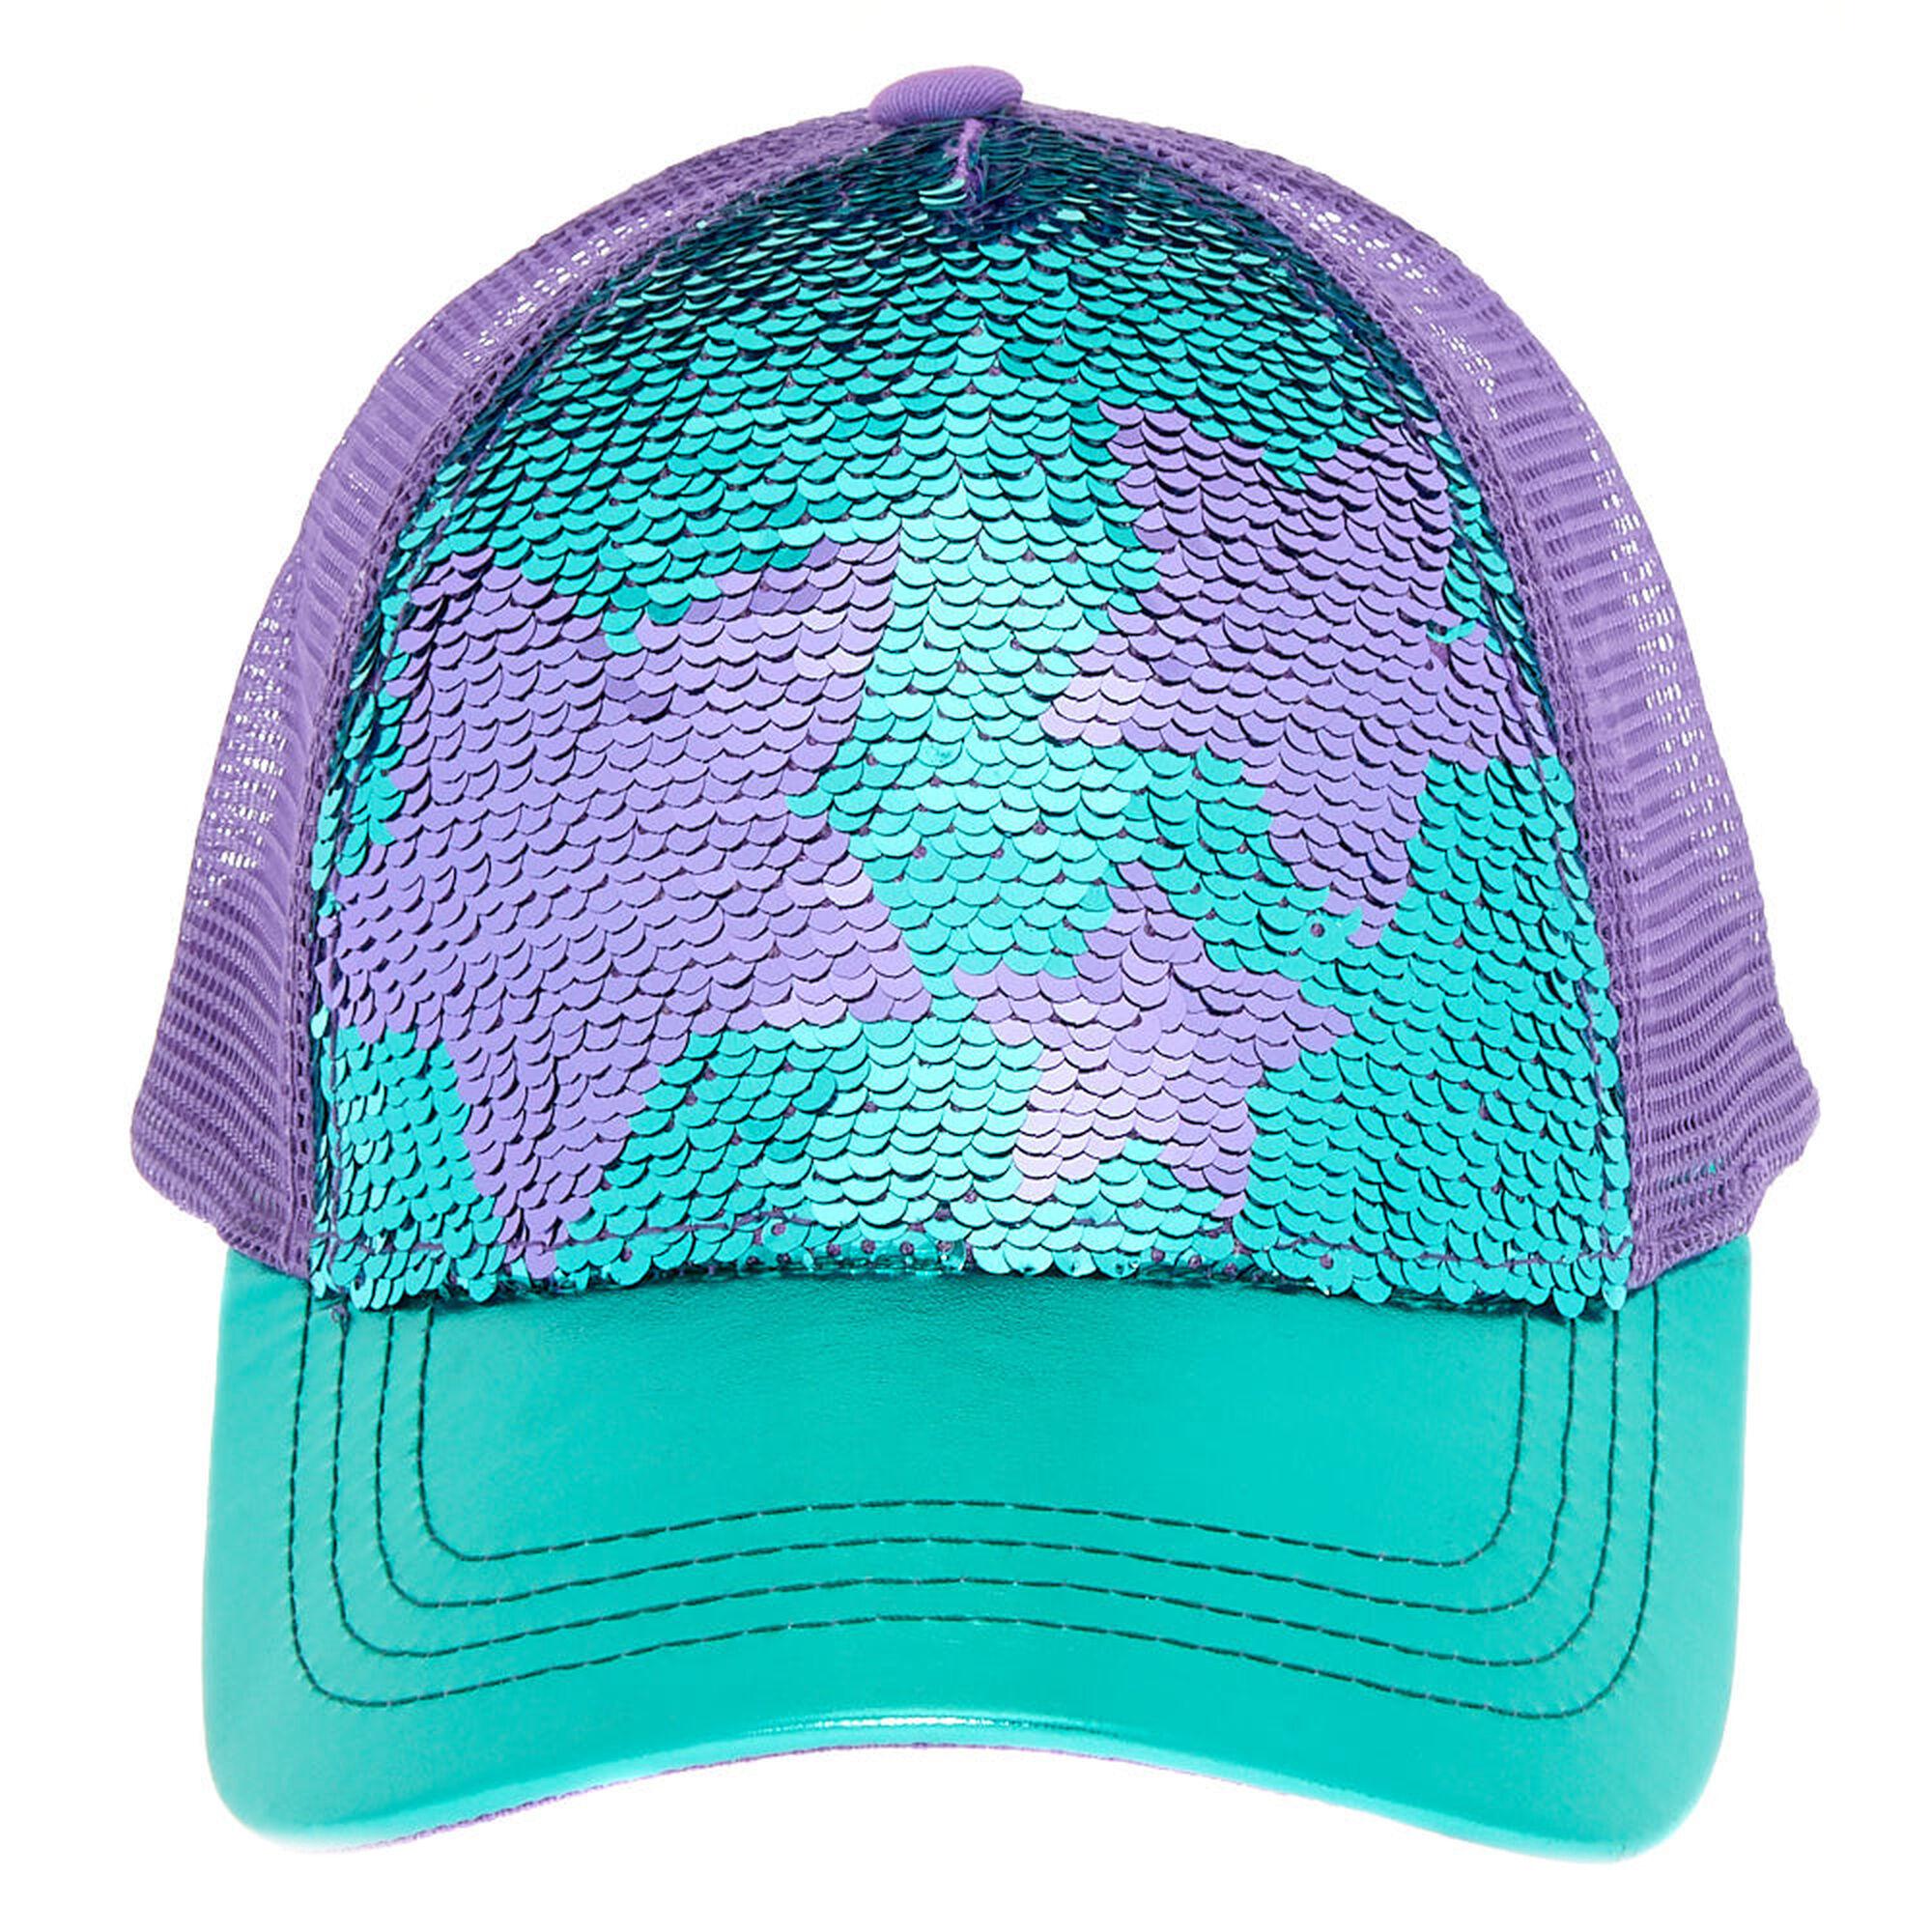 ... Star Sequin Baseball Cap - Turquoise 77da57d0fd0f